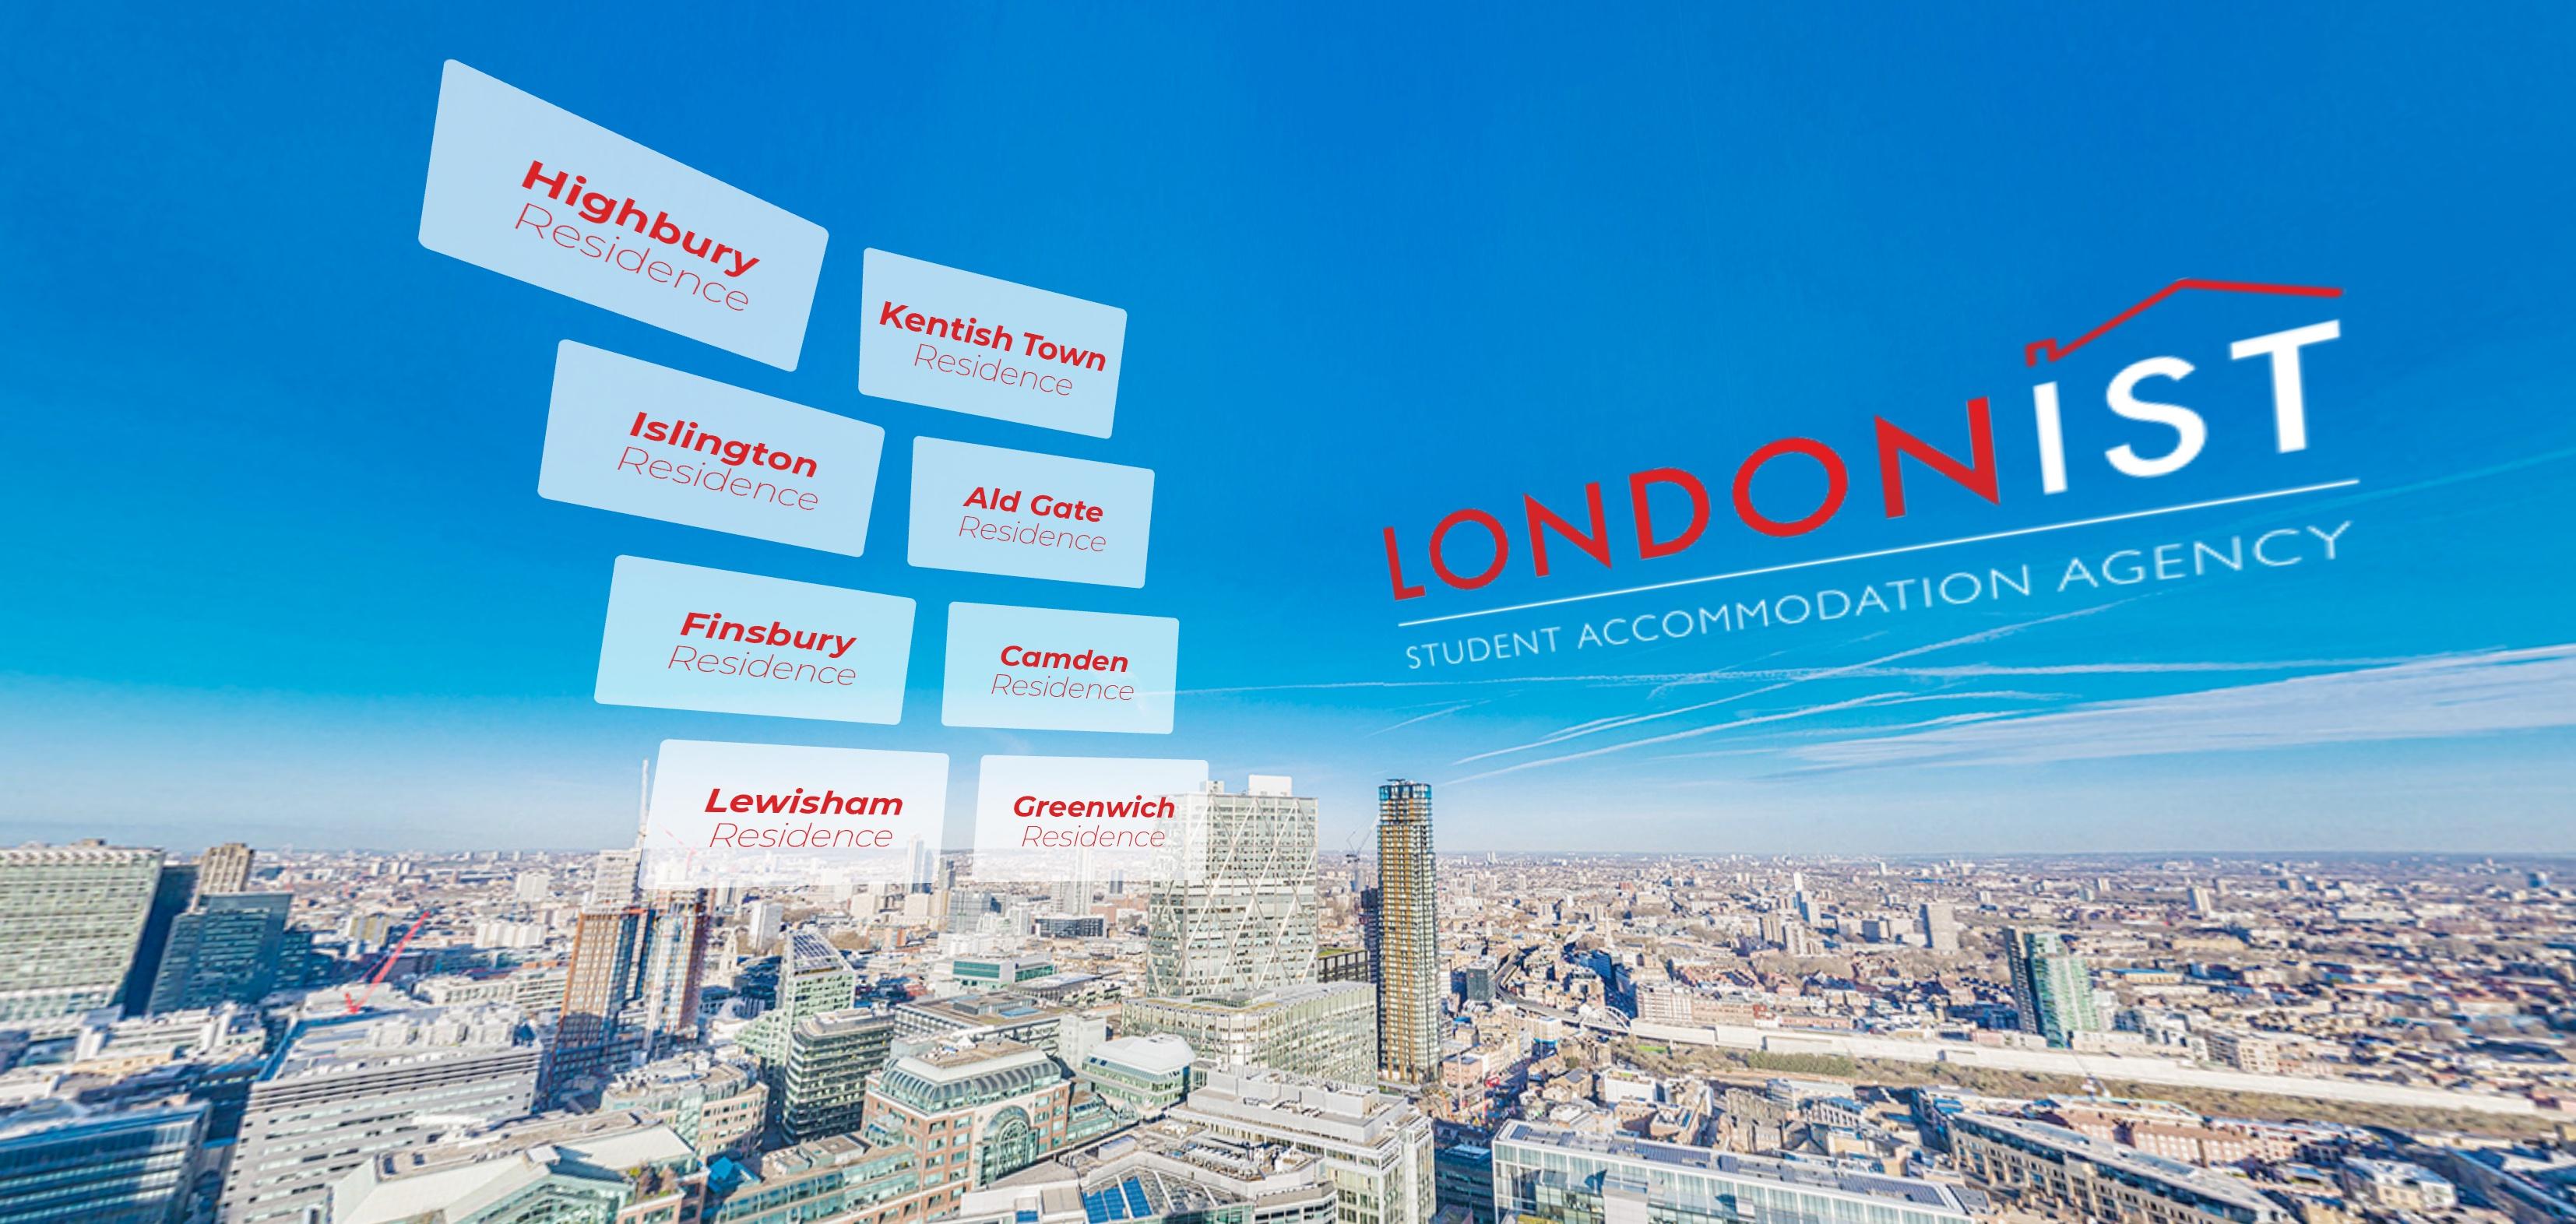 ICEF Londonist Student Accomodation Agency 1 1024x487